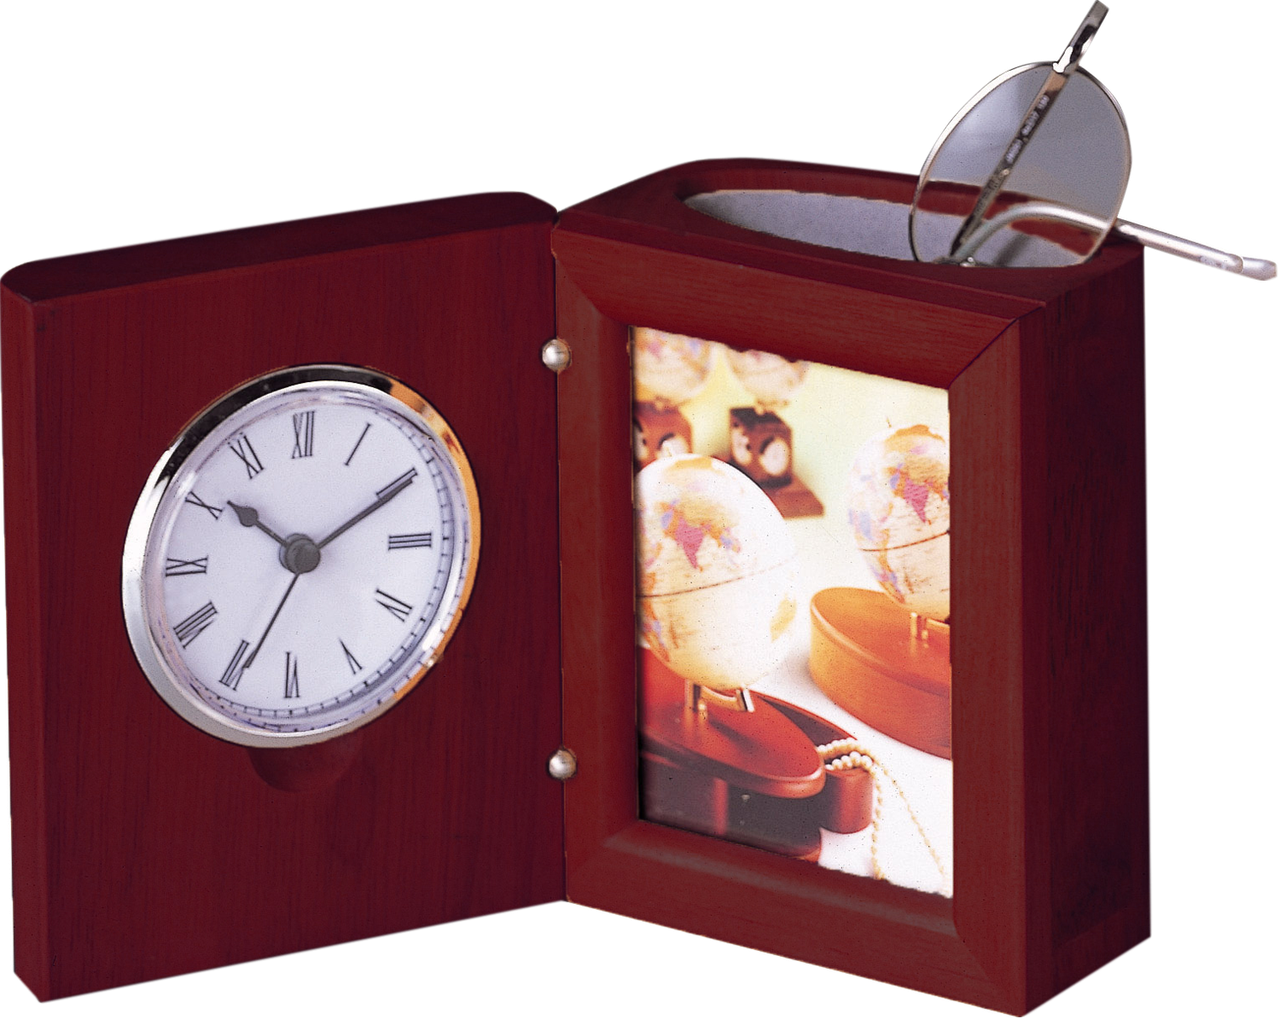 Настприбор(часыфоторам)крдер